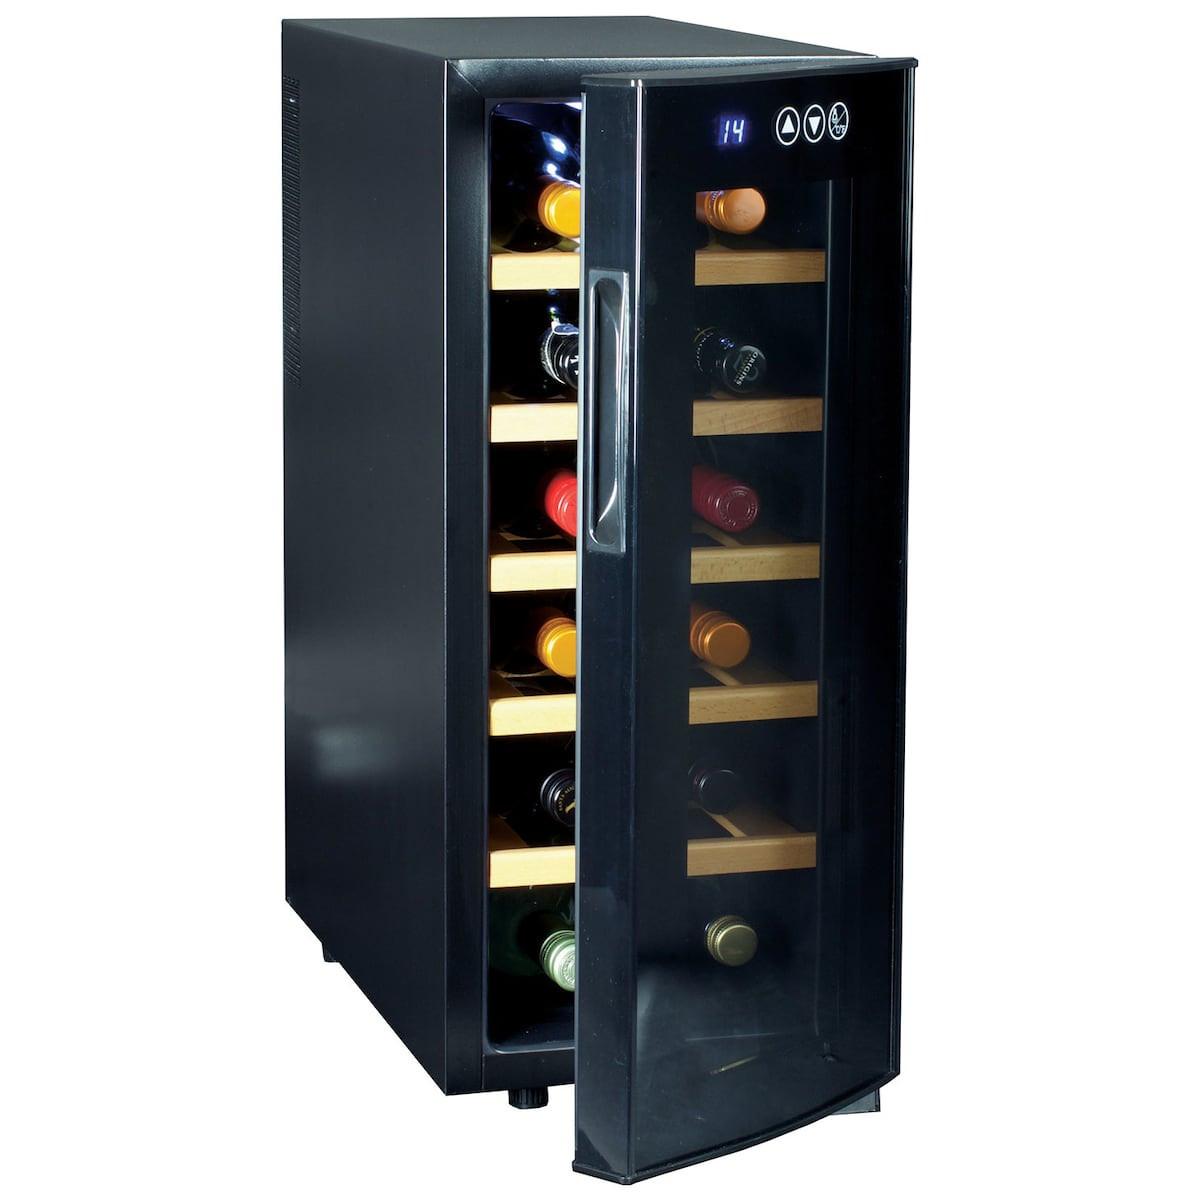 wine bottle wall vase of glass bottle at linen chest intended for k wc 242856 12 bottle wine cooler open resize